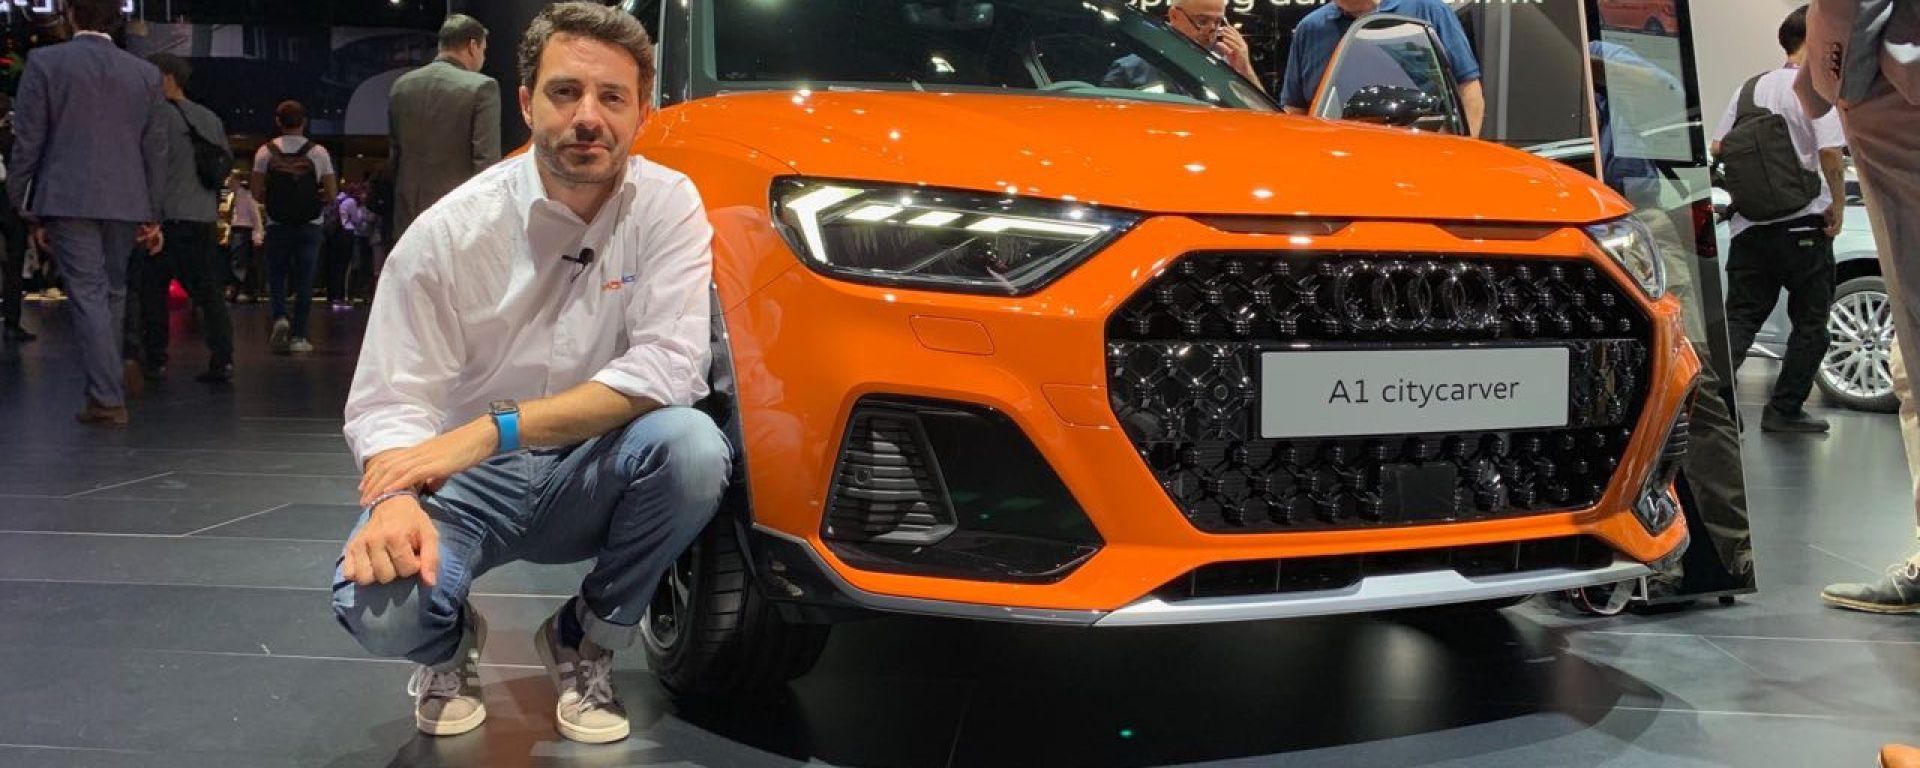 Audi A1 Citycarver, in video dal Salone di Francoforte 2019